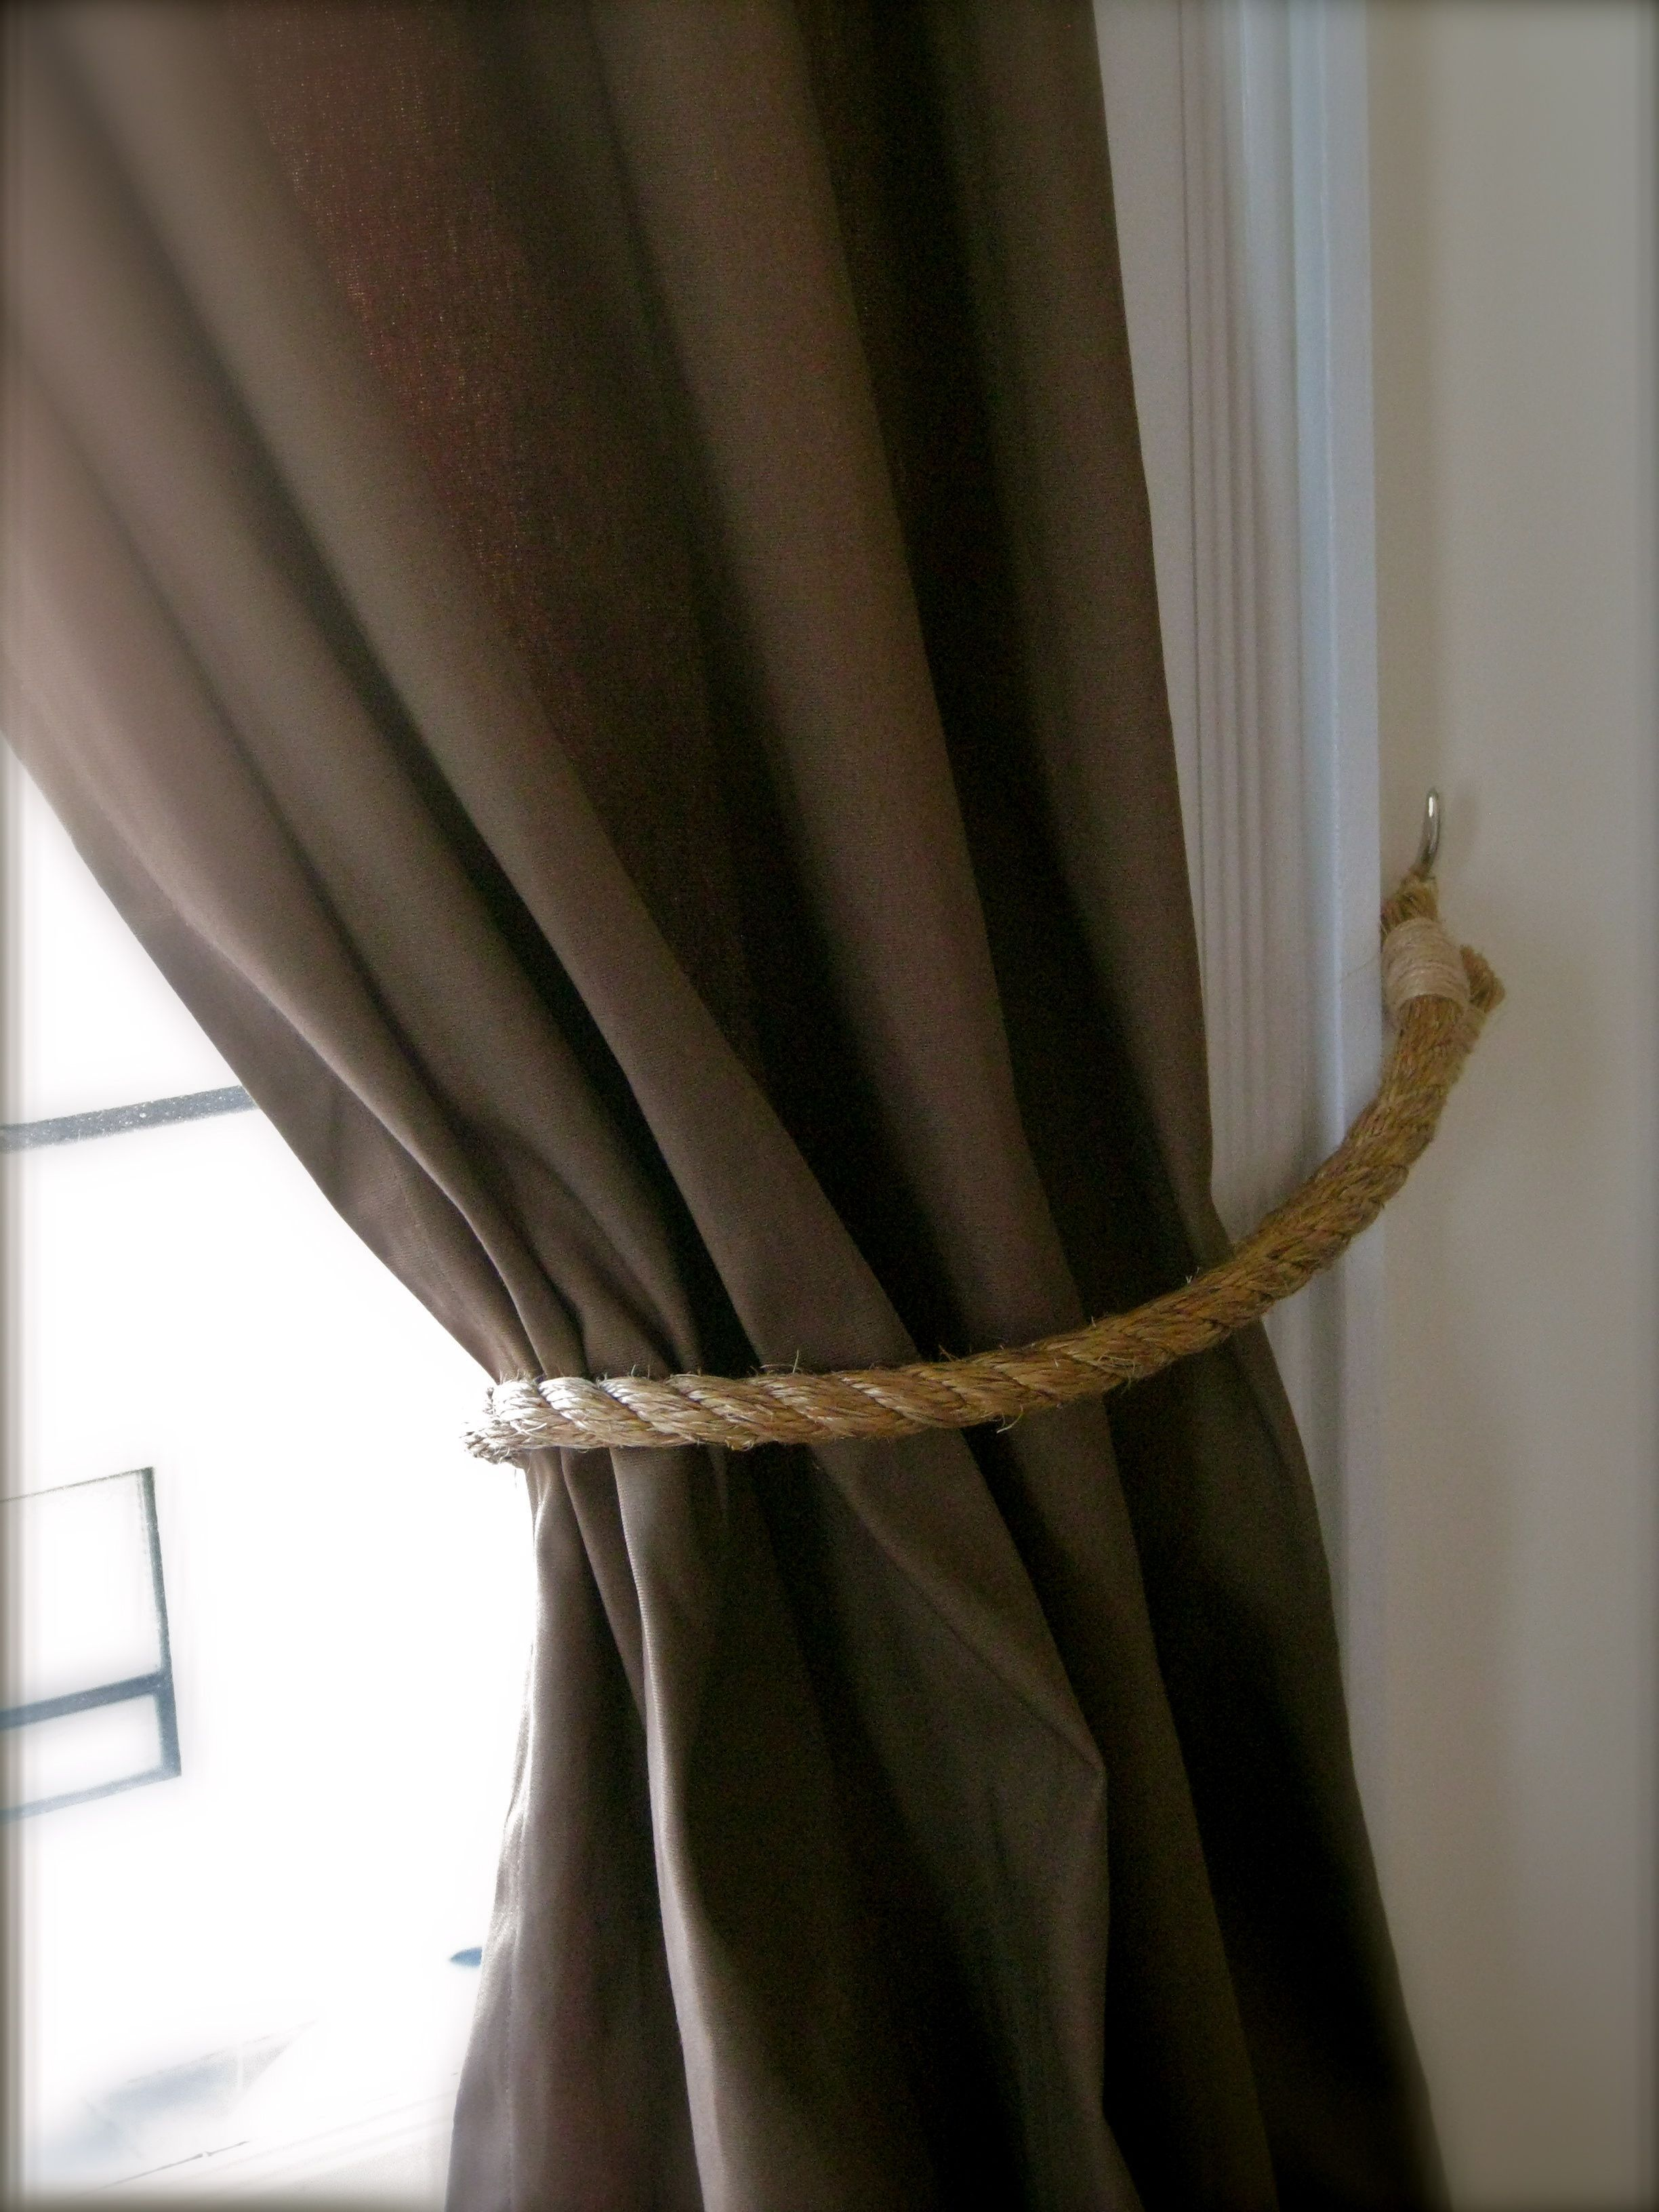 Curtain hardware tiebacks - Curtain Tie Backs Diy Followed Their Careful Instructions And